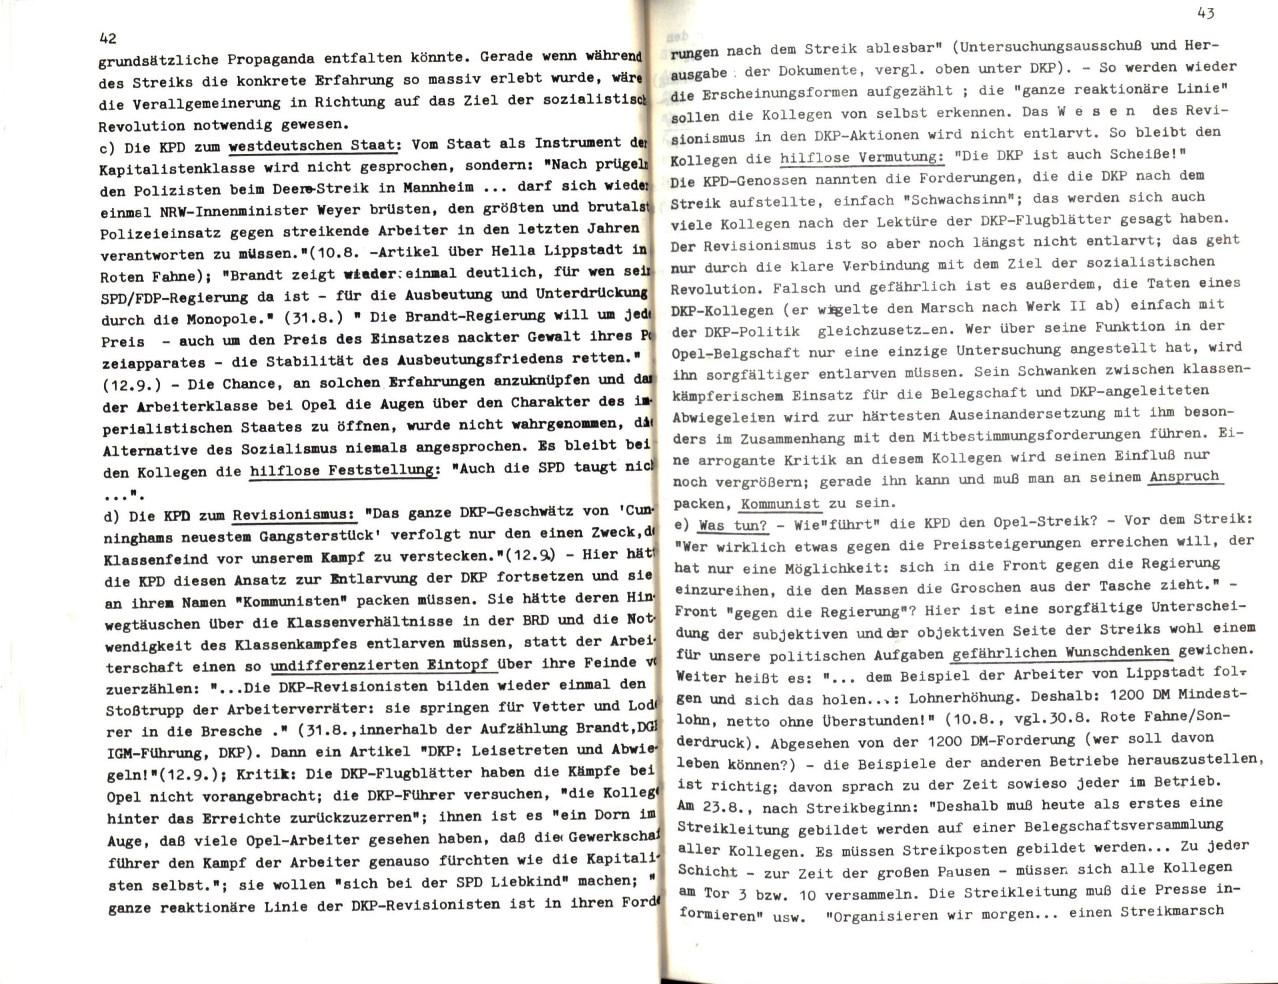 Bochum_IGM_Opel_PG_Opel_streikt_1973_023